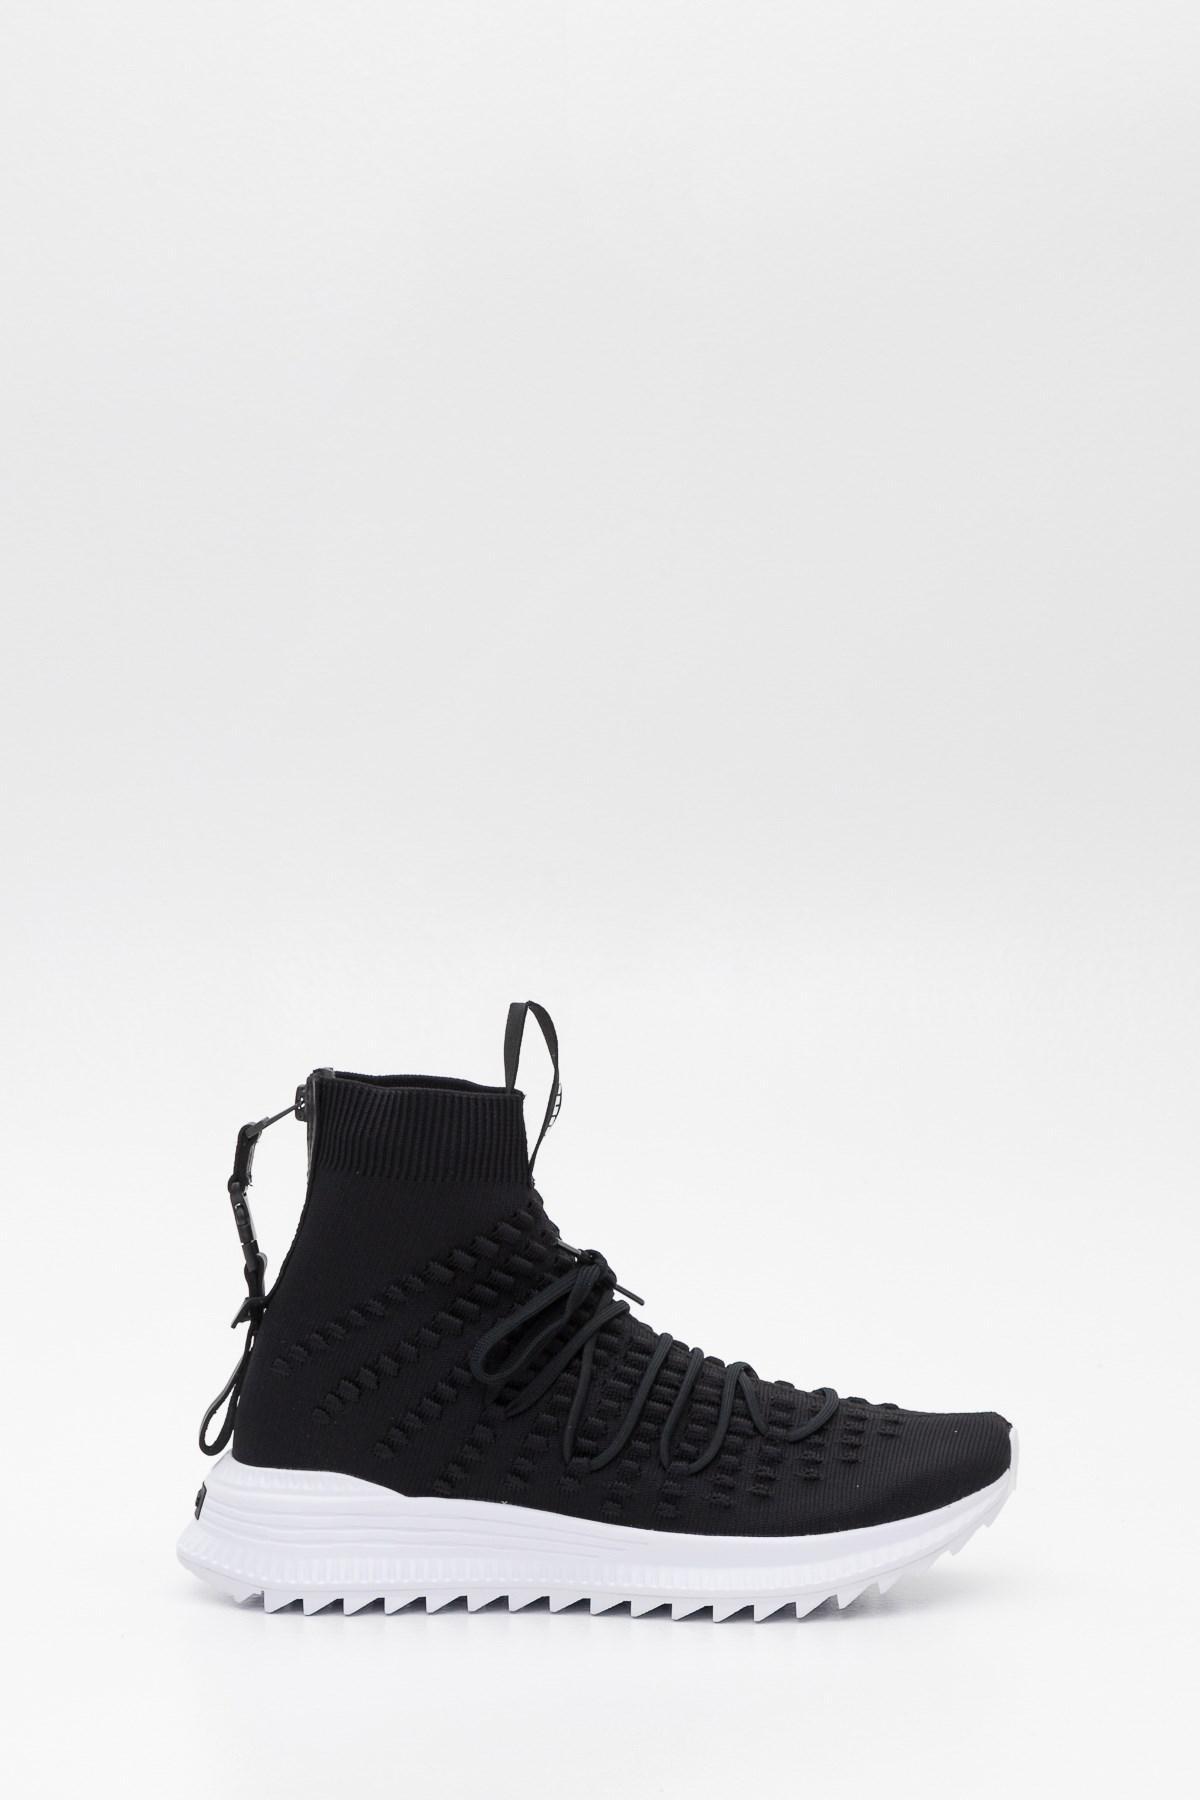 Lyst - PUMA Avid Fusefit Mid Sneakers in Black for Men 8a0df11c0